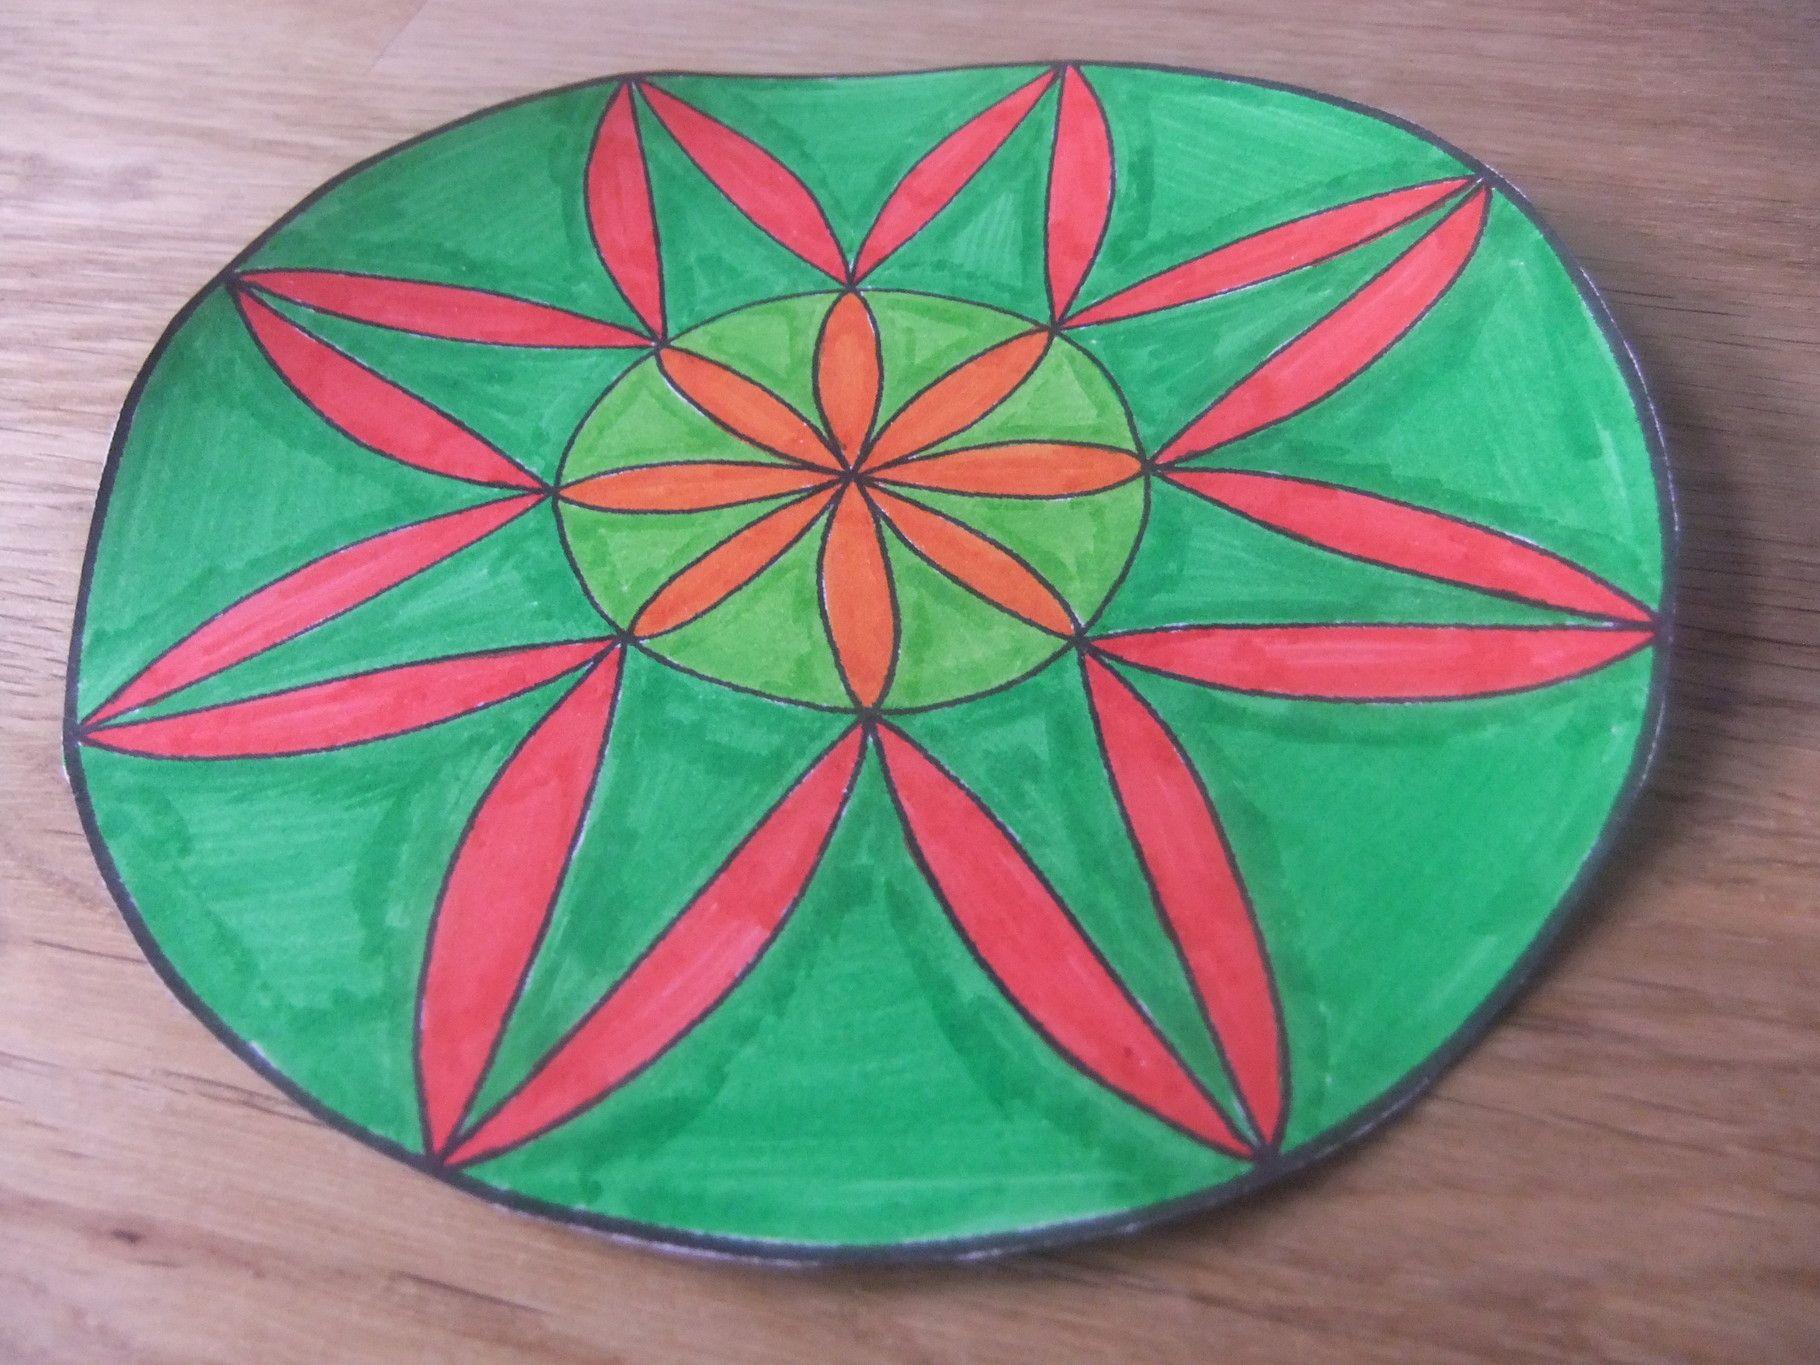 Mandalas zum Ausdrucken | Mandalas zum Ausdrucken (Ausmalbilder ...